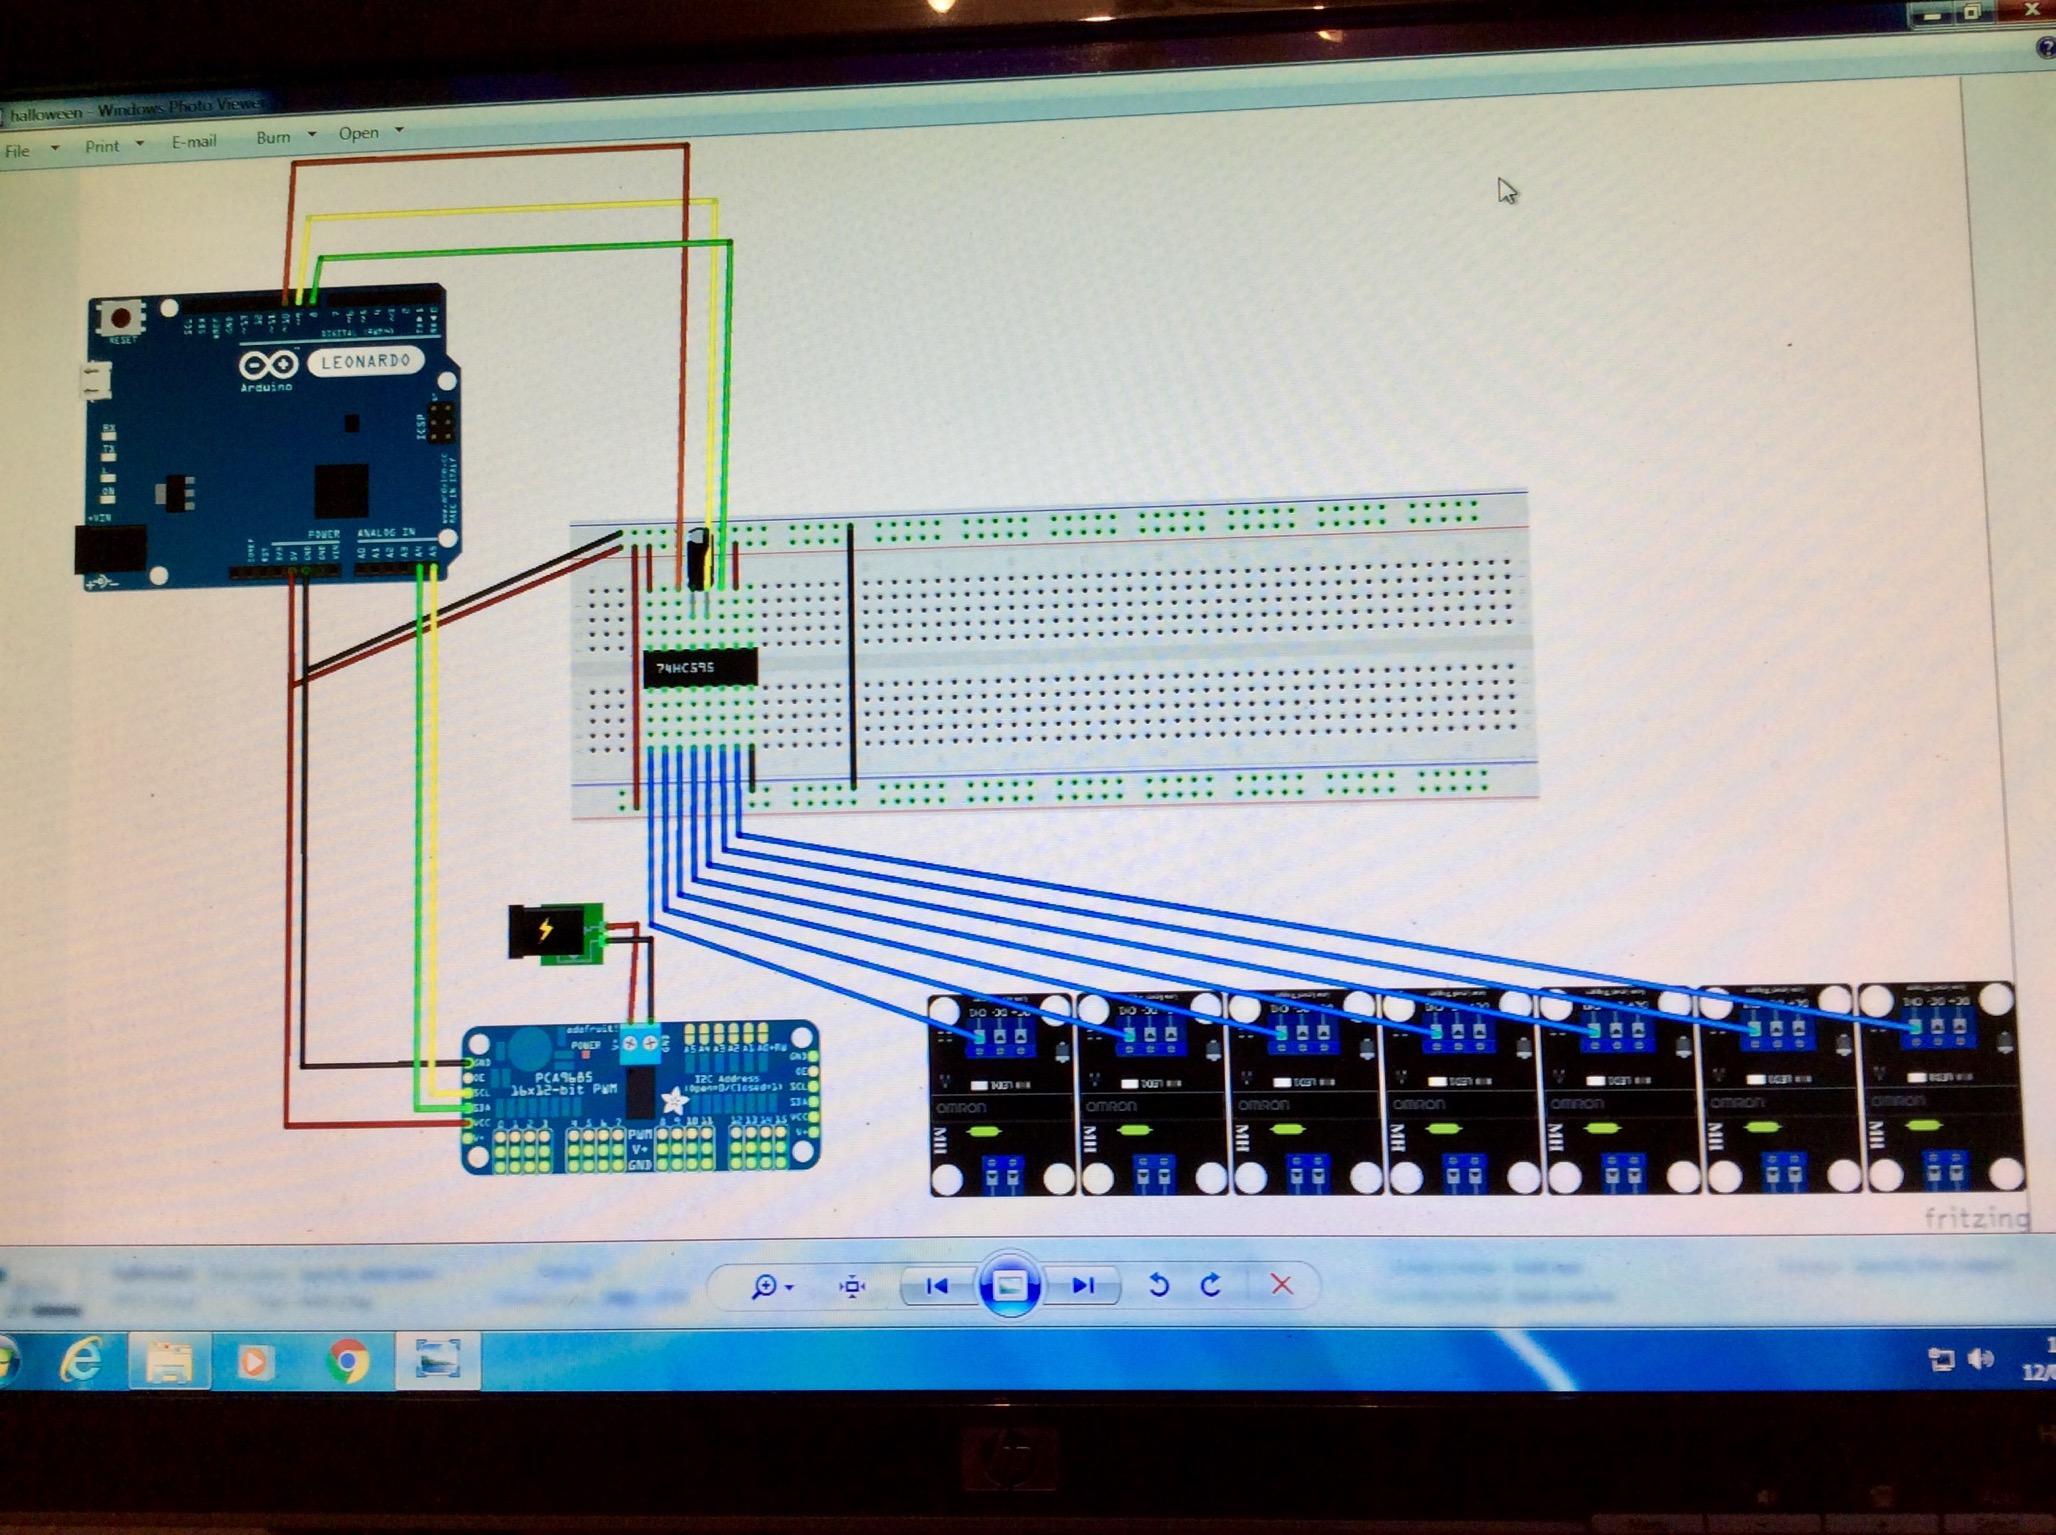 Newbie Advice Please Projects Fritzing Forum Pwm Electronics Circuits And Microcontrollers E236e4f7 Fe05 4c7b Ba83 8cc2728ec7b4jpeg2056x1535 610 Kb